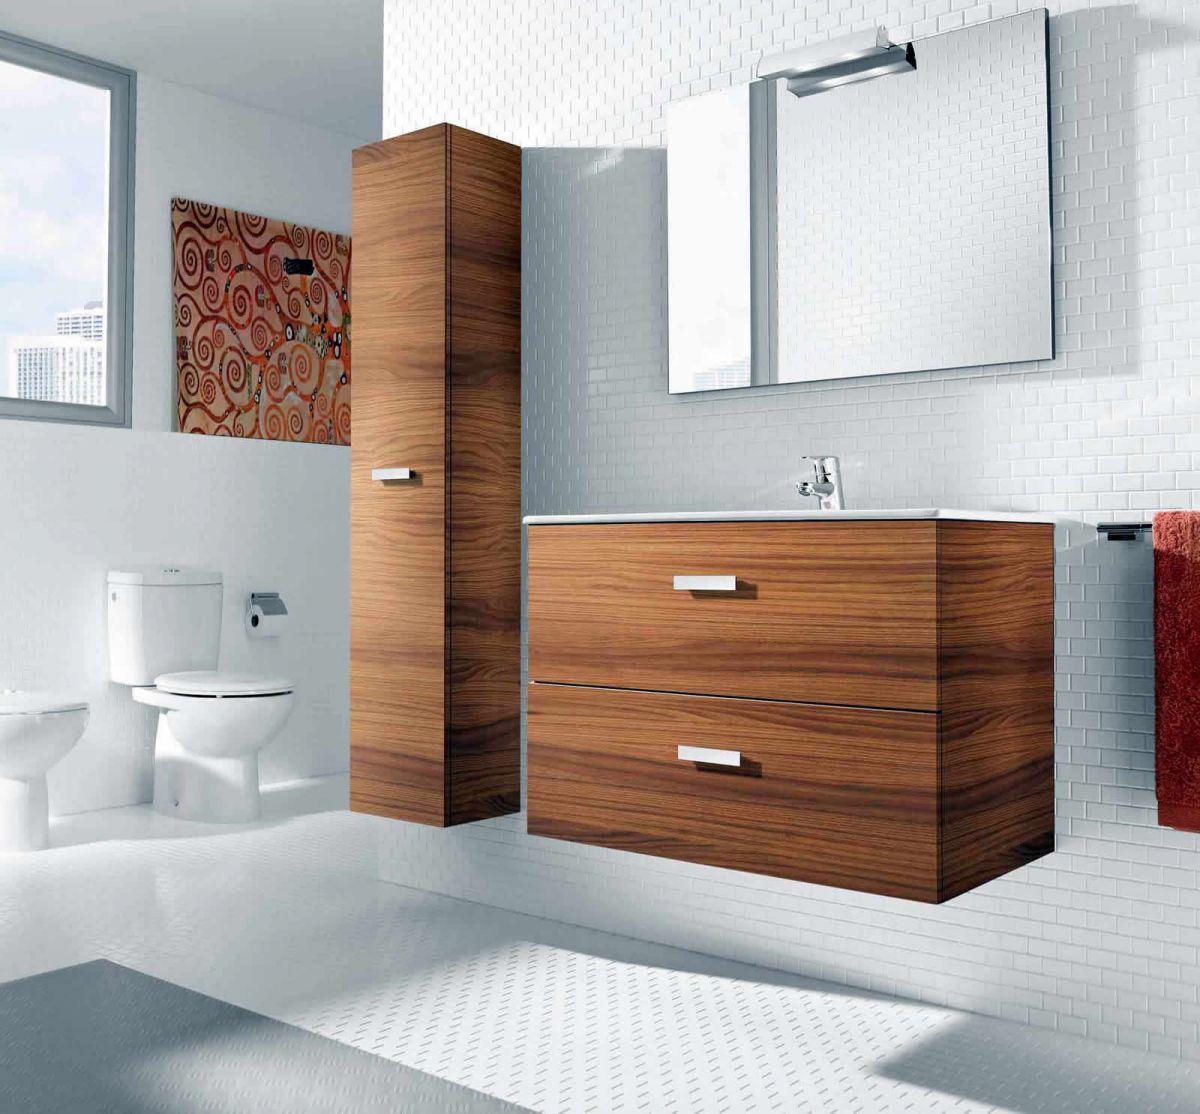 Stunning Bathroom Vanity Units Victoria Globorank roca bathroom vanity units